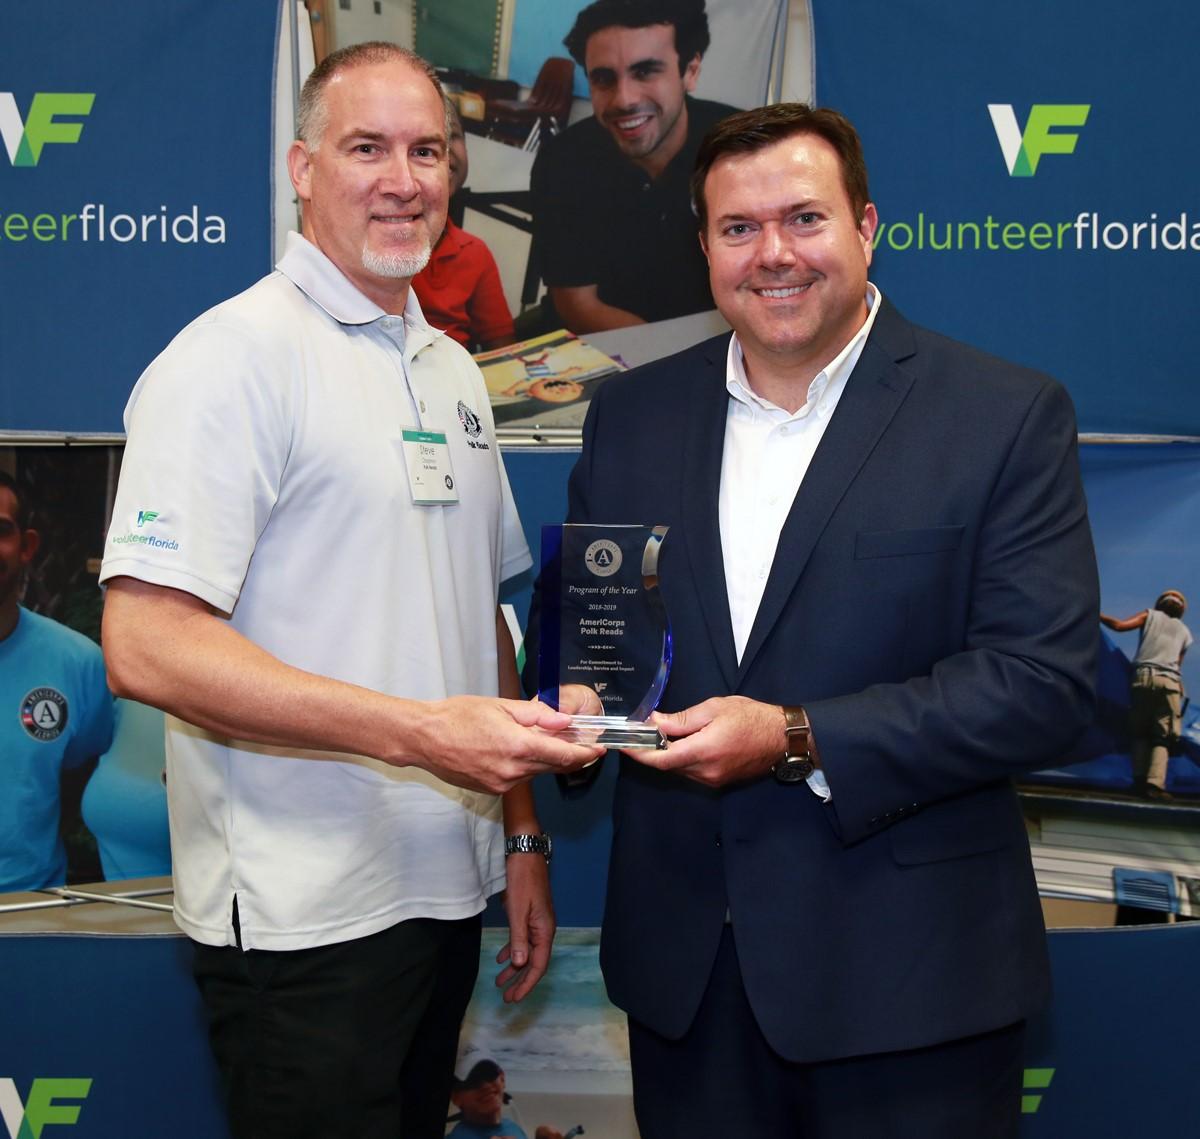 Volunteer Florida giving award to AmeriCorps Polk Reads program direct Steve Chapman